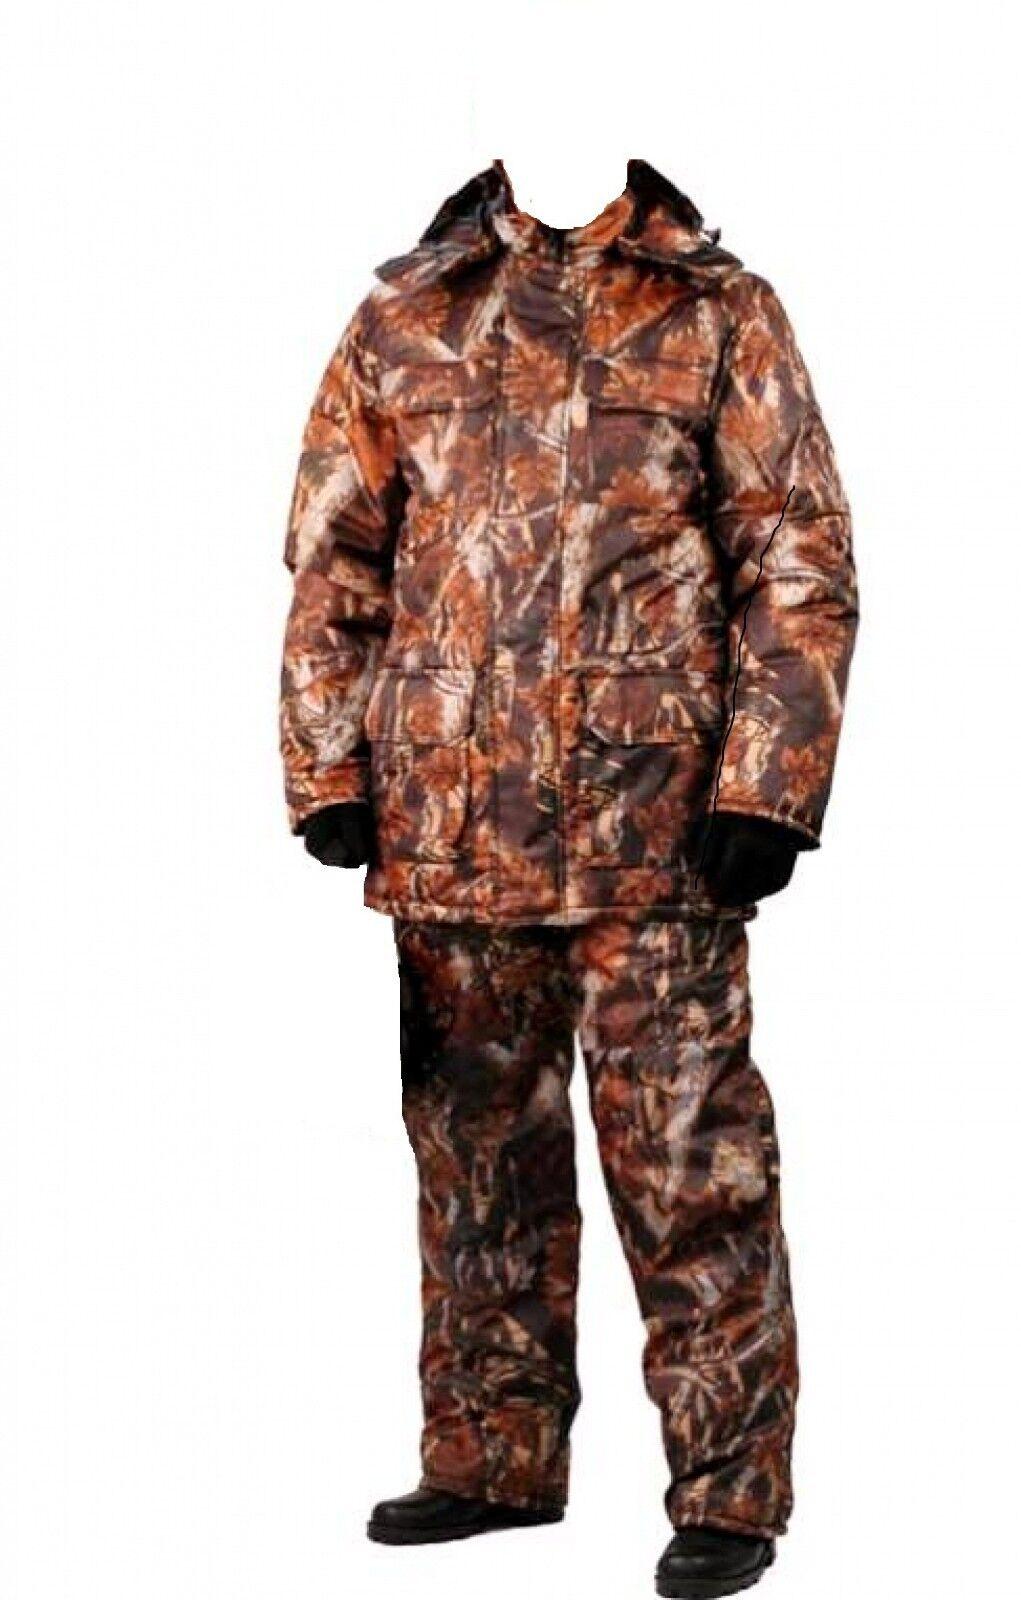 Warm pesca Hunting Camouflage Suit Set Jacket Trousers Bib e Brace XL nuovo